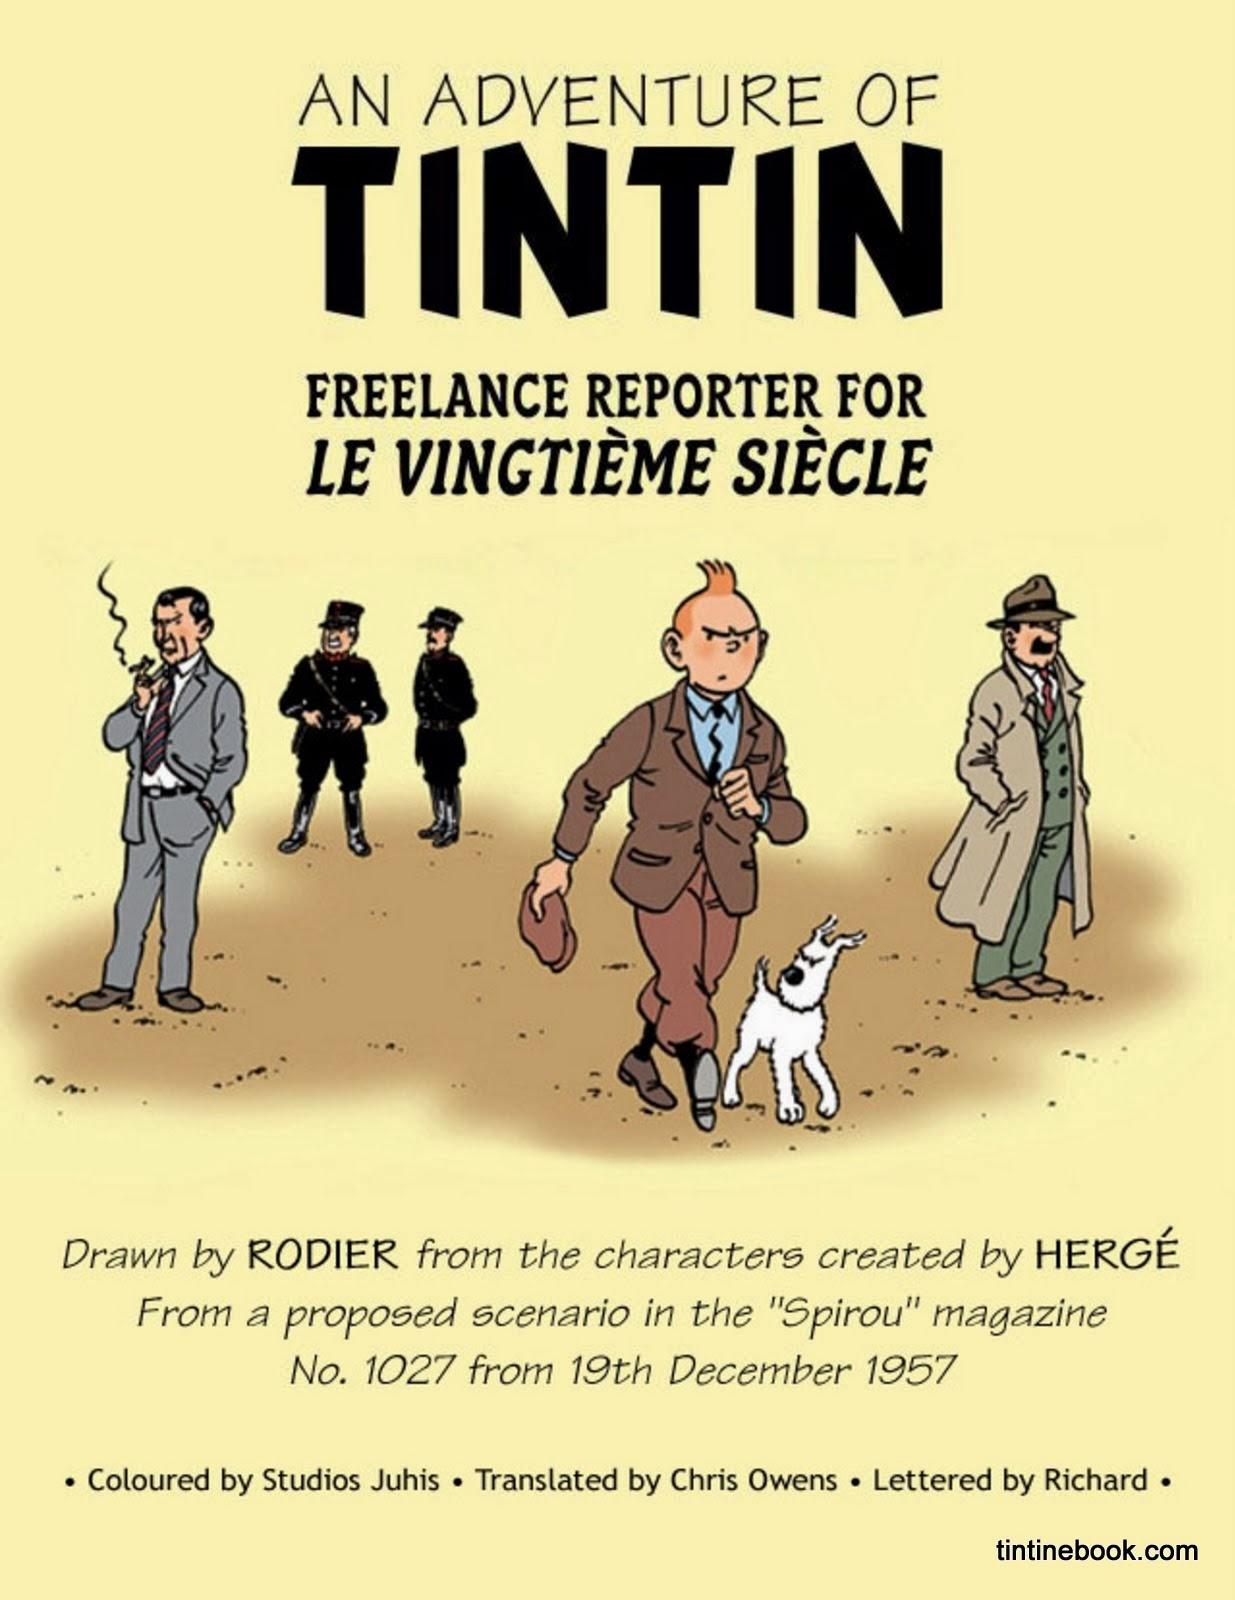 27. tintin the freelance reporter - tintin ebook